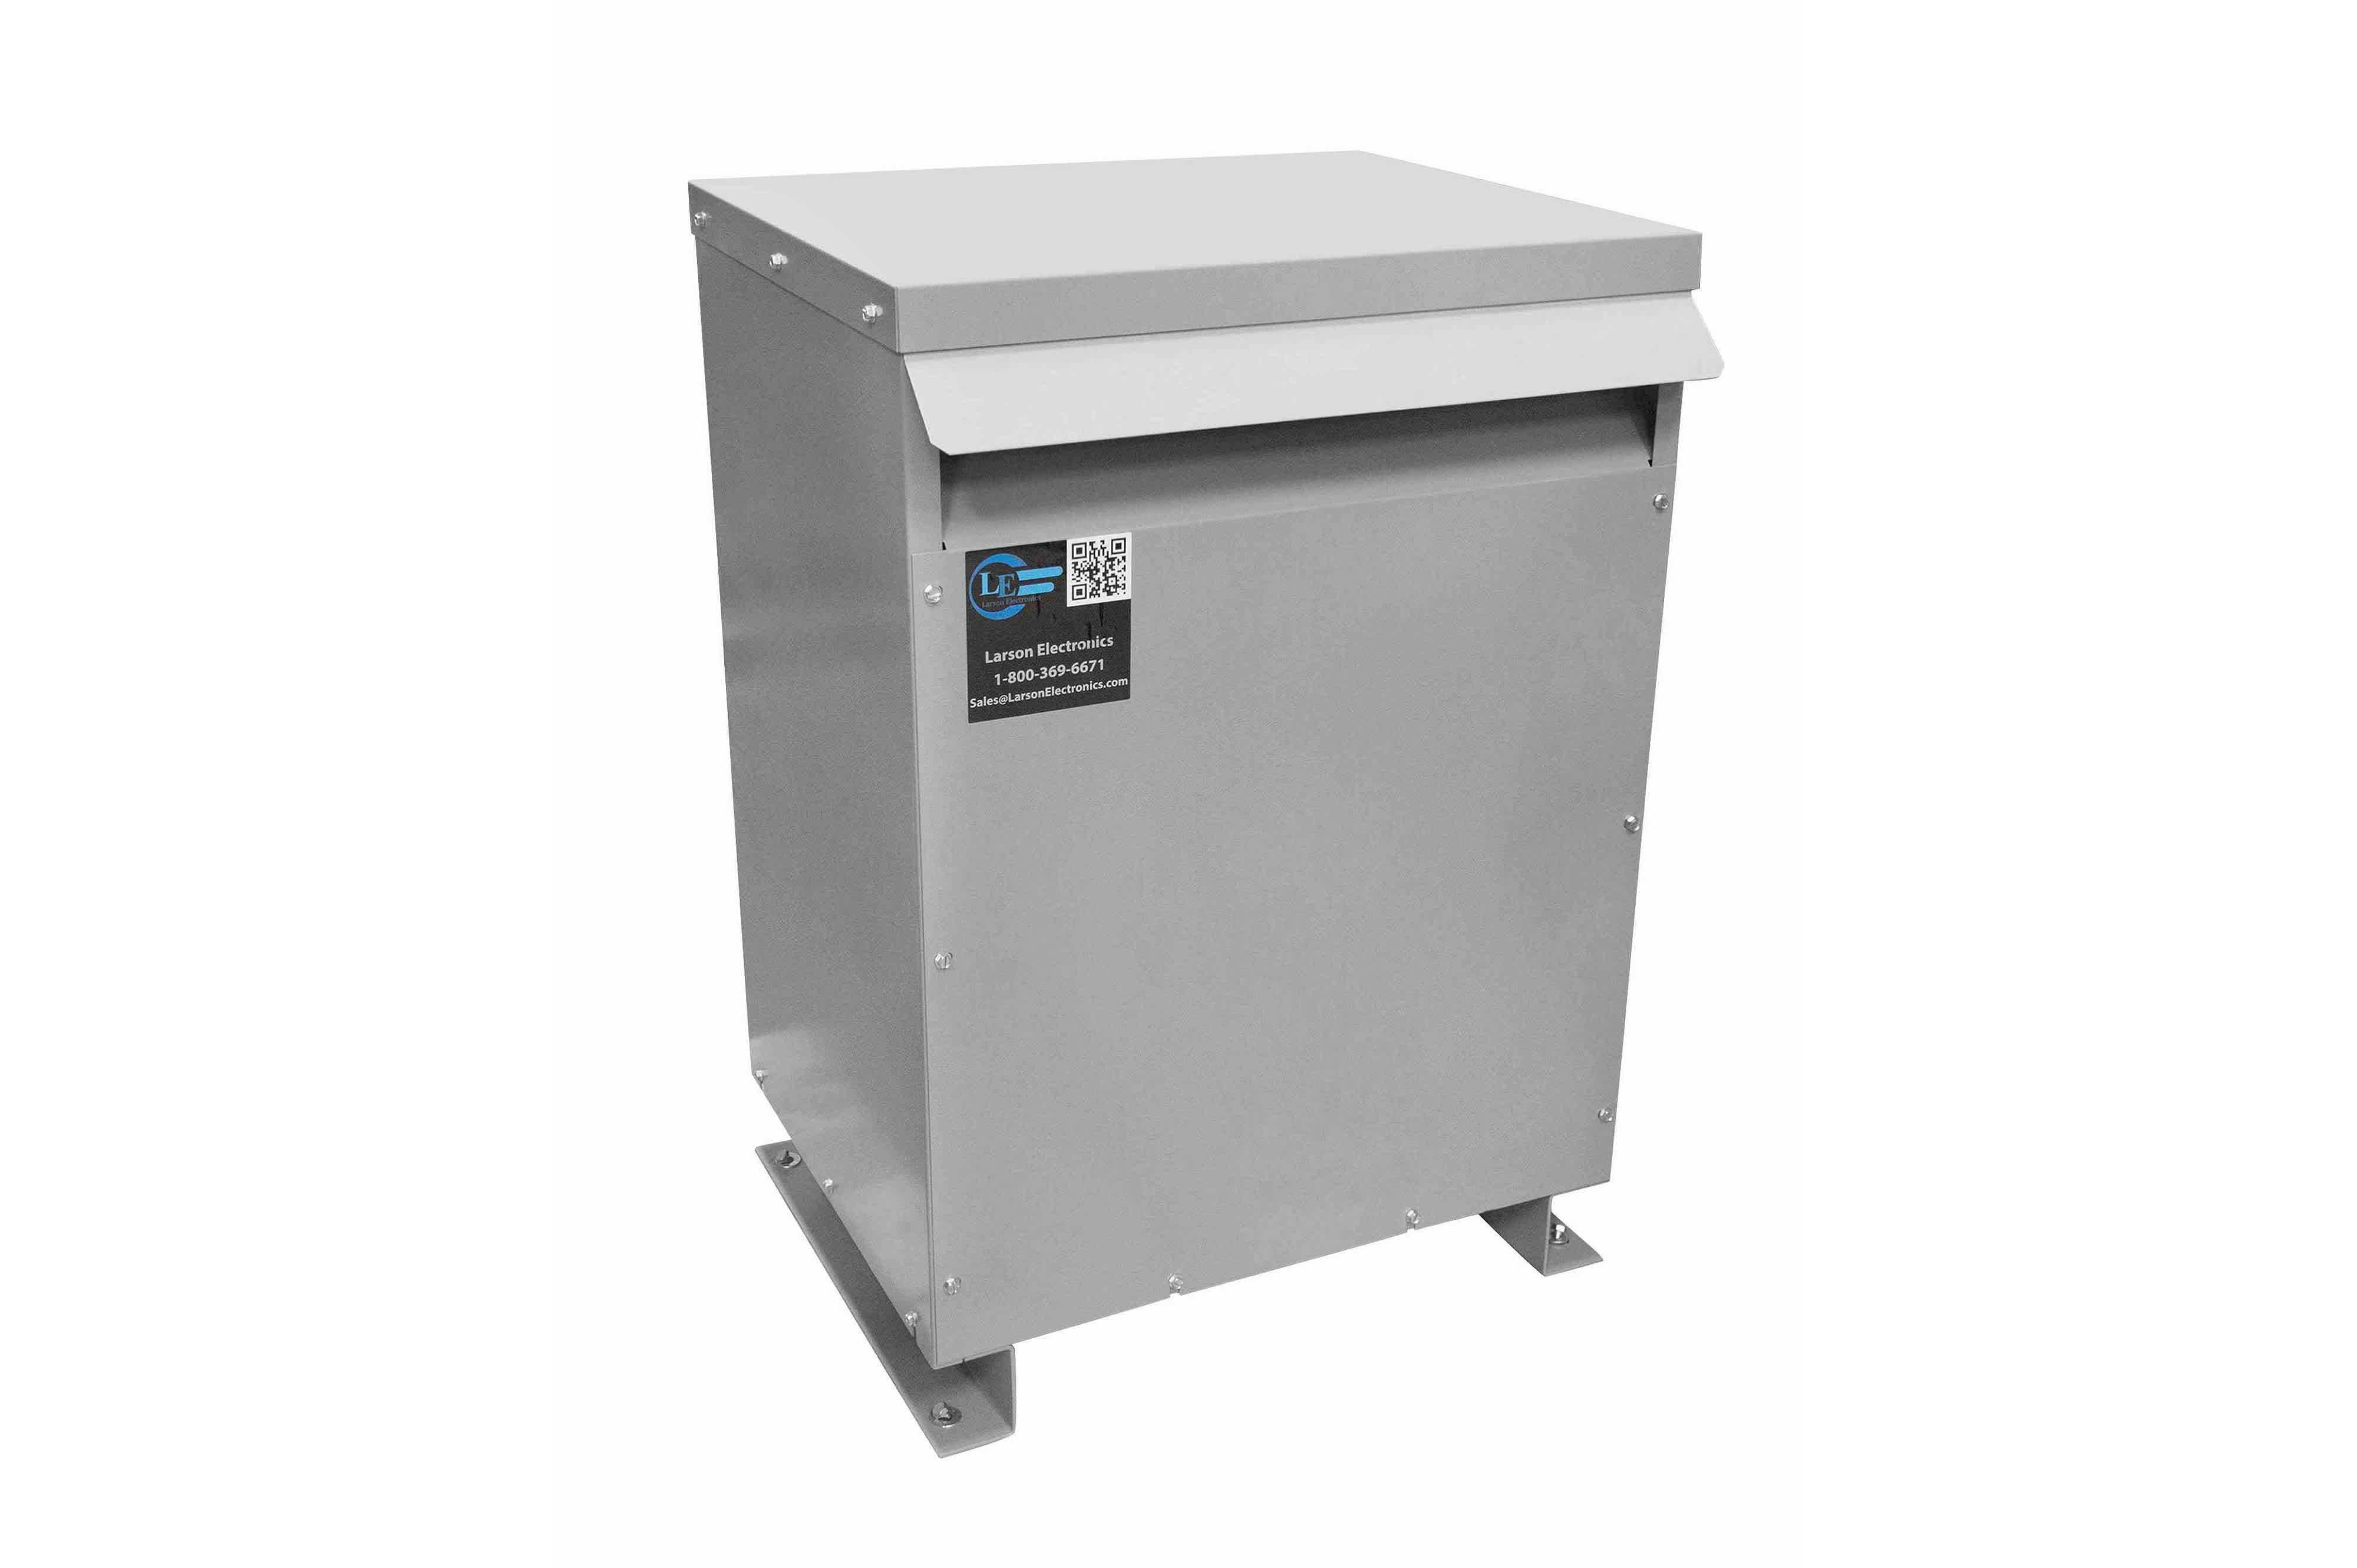 25 kVA 3PH Isolation Transformer, 380V Wye Primary, 480Y/277 Wye-N Secondary, N3R, Ventilated, 60 Hz